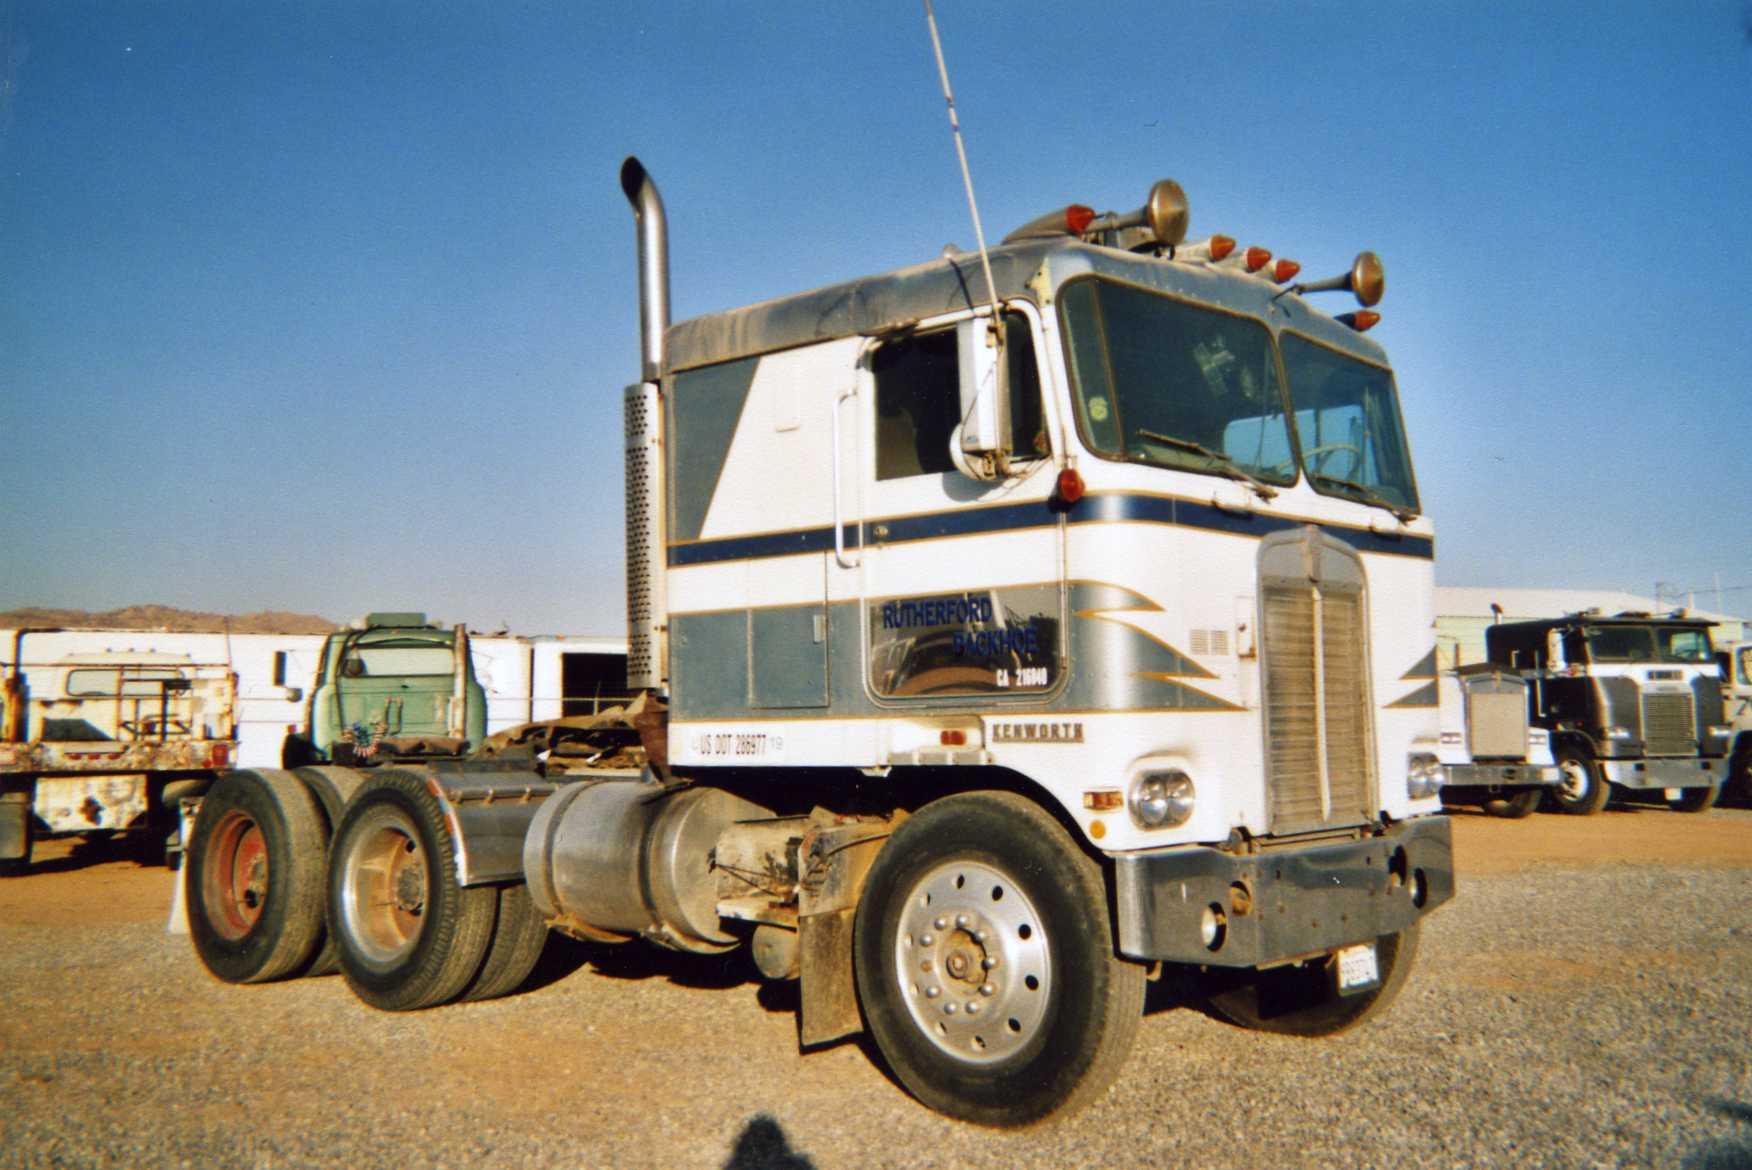 Westway Truck Sales ♢ Truck and Trailer Parking Or Storage